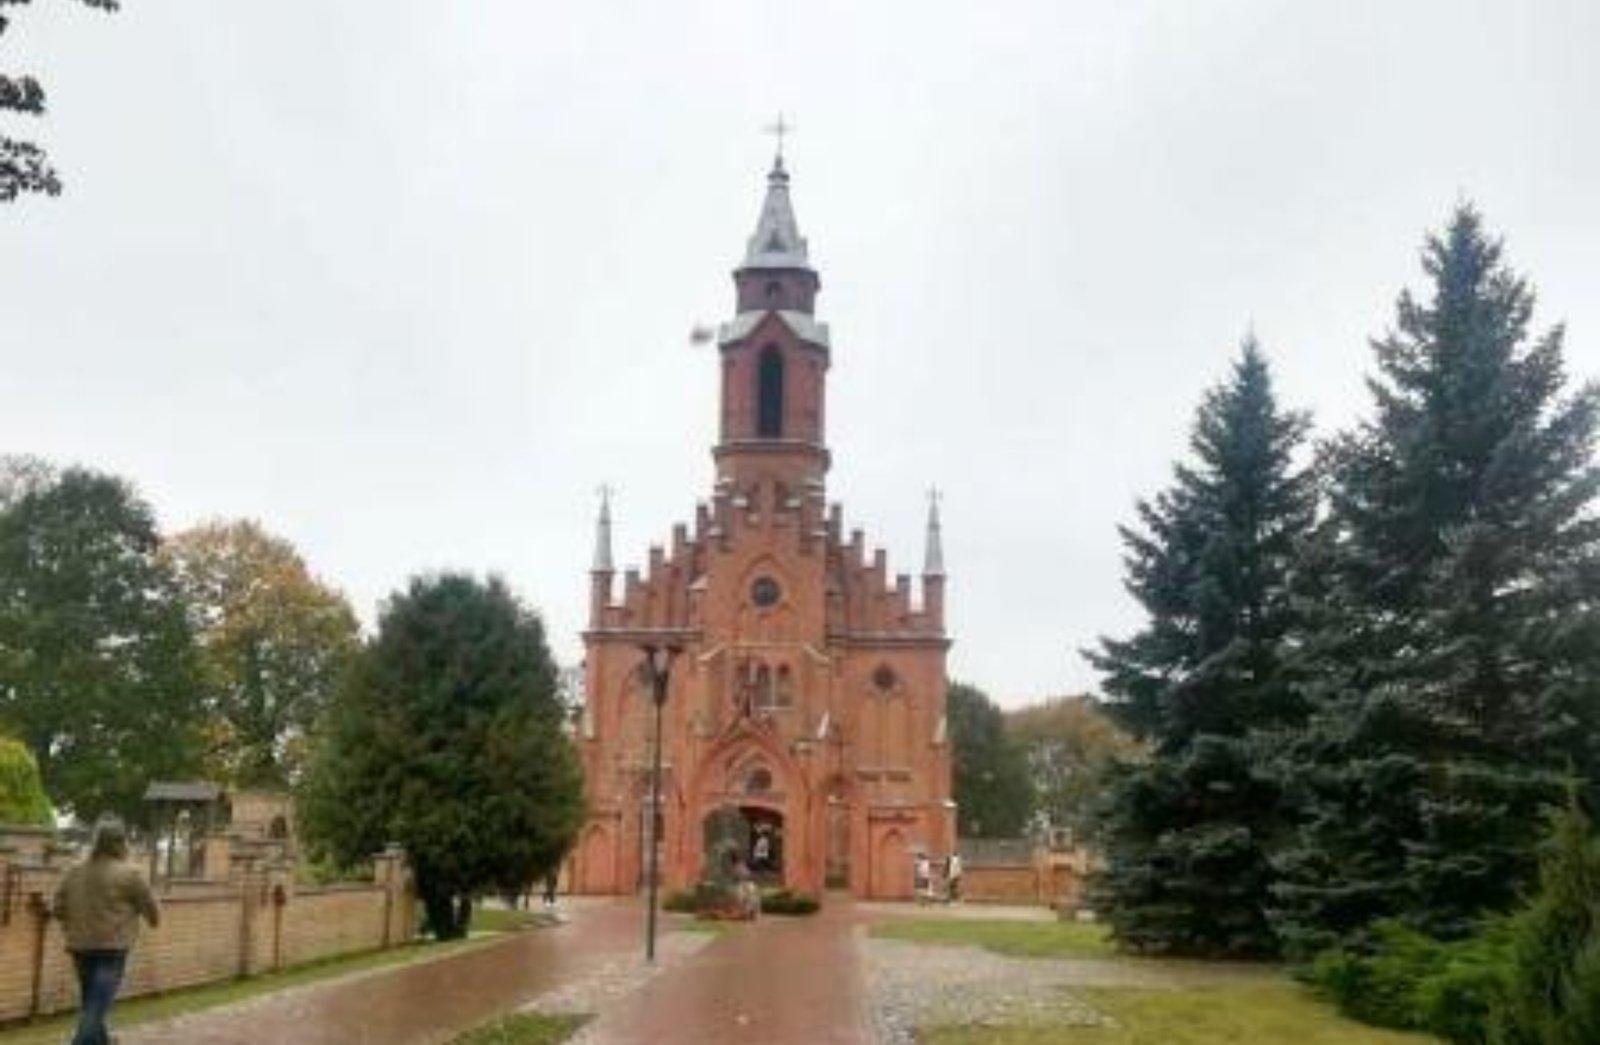 Kernavės bažnyčios istorijos vingiais su profesoriumi Aleksu Luchtanu